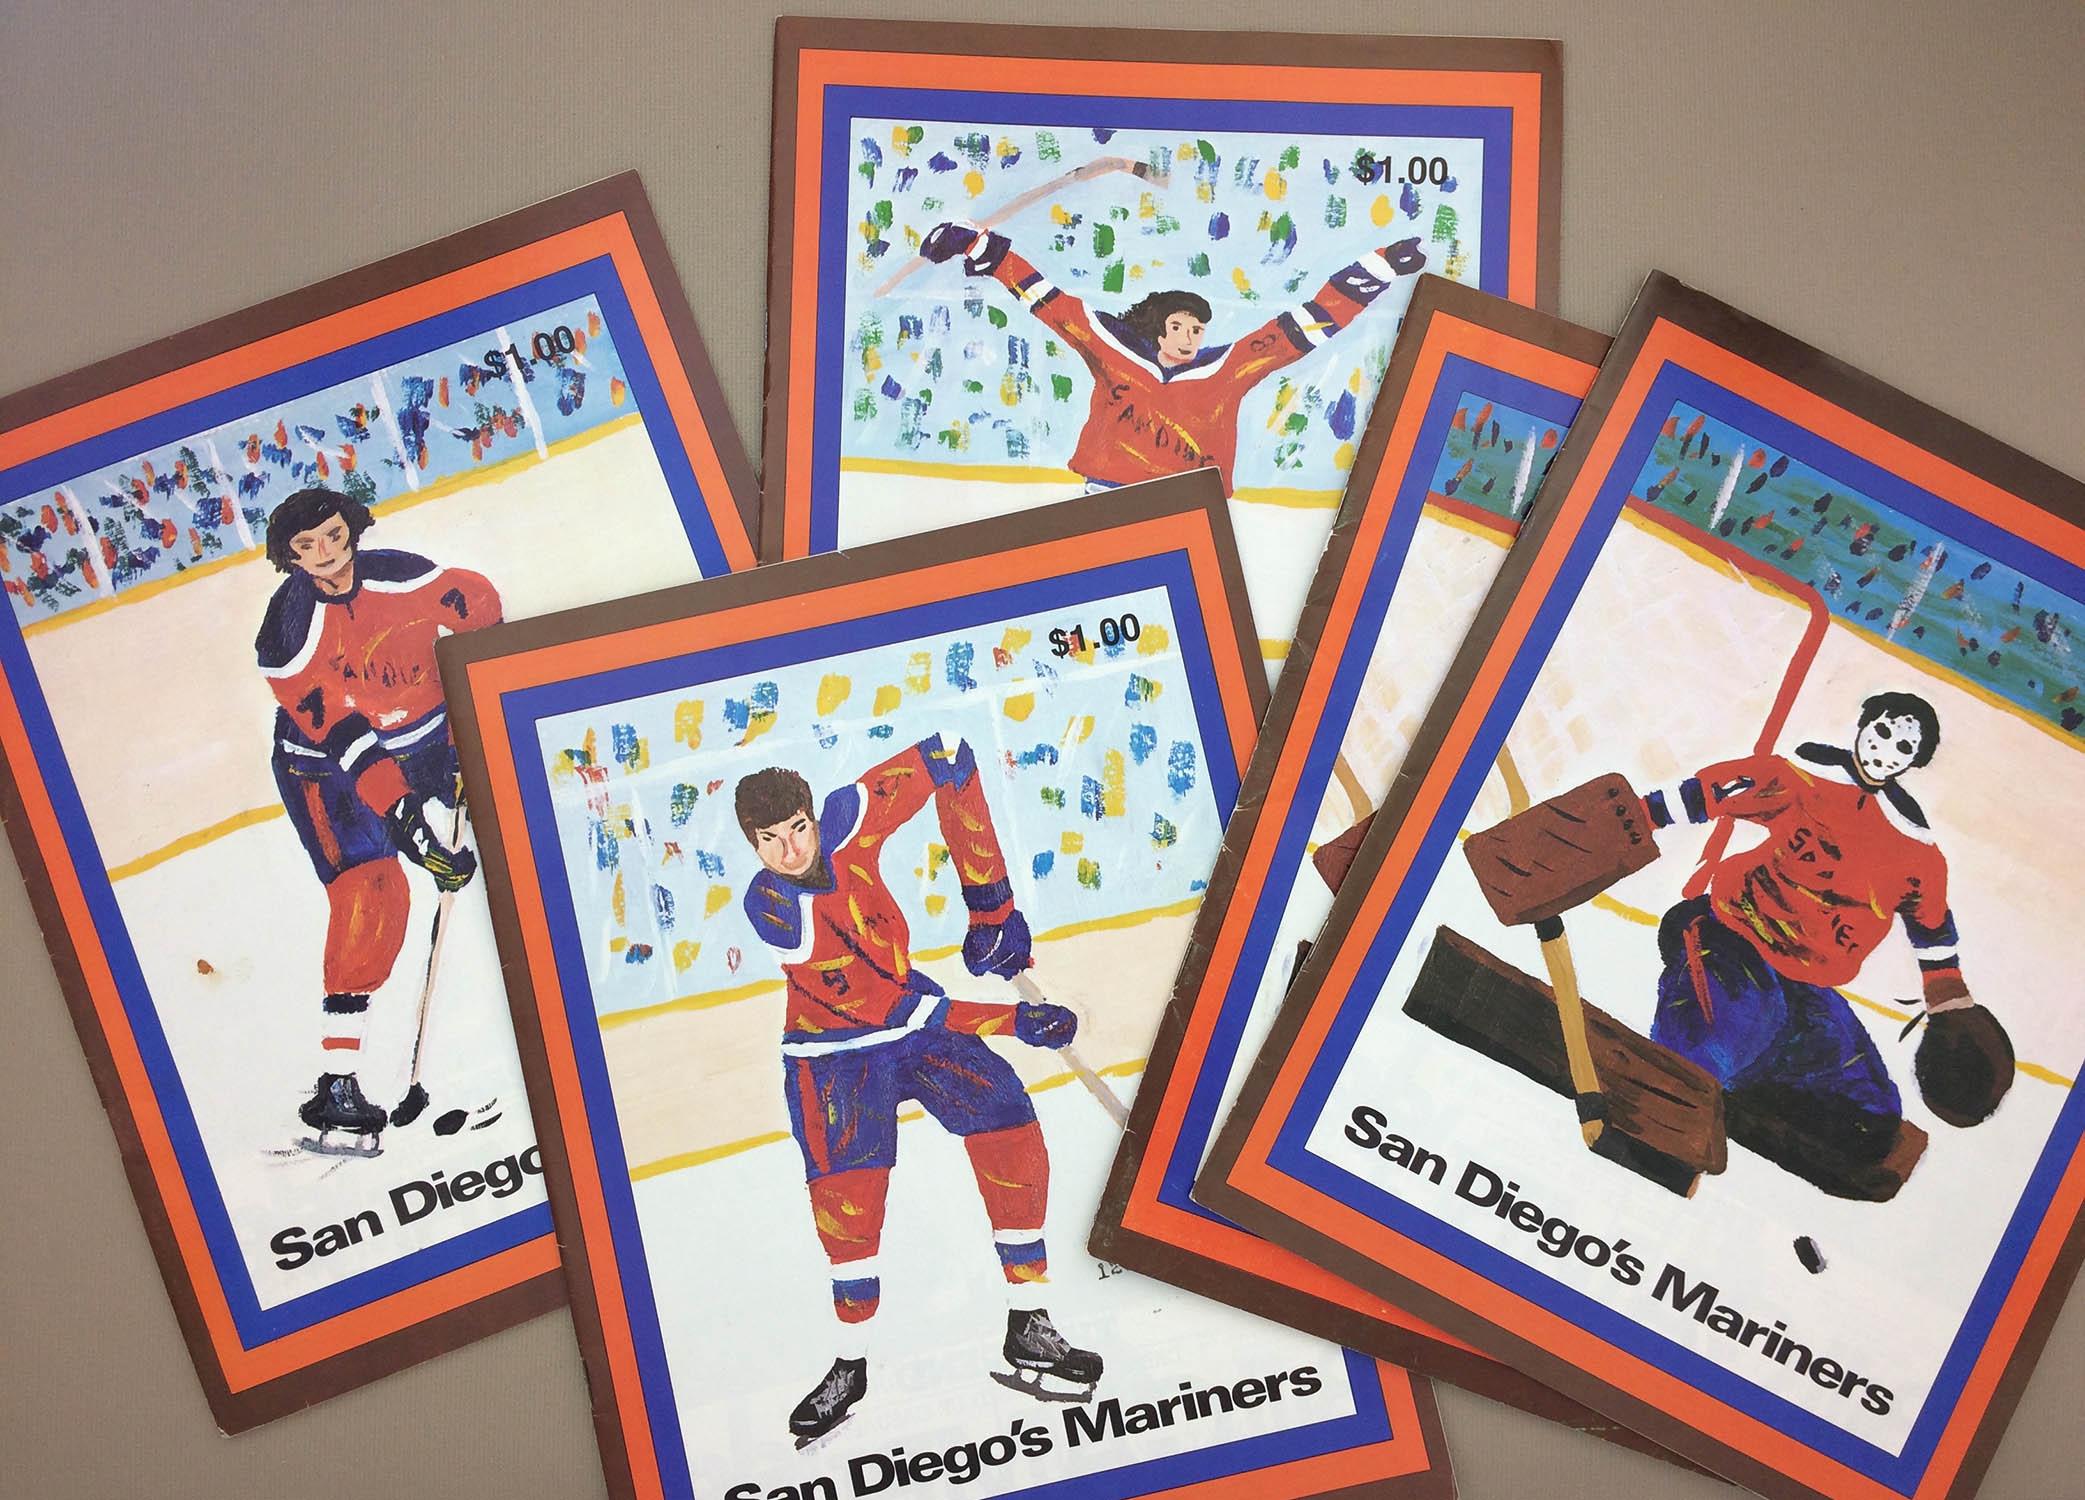 San Diego Mariners 1977-78 Program Covers